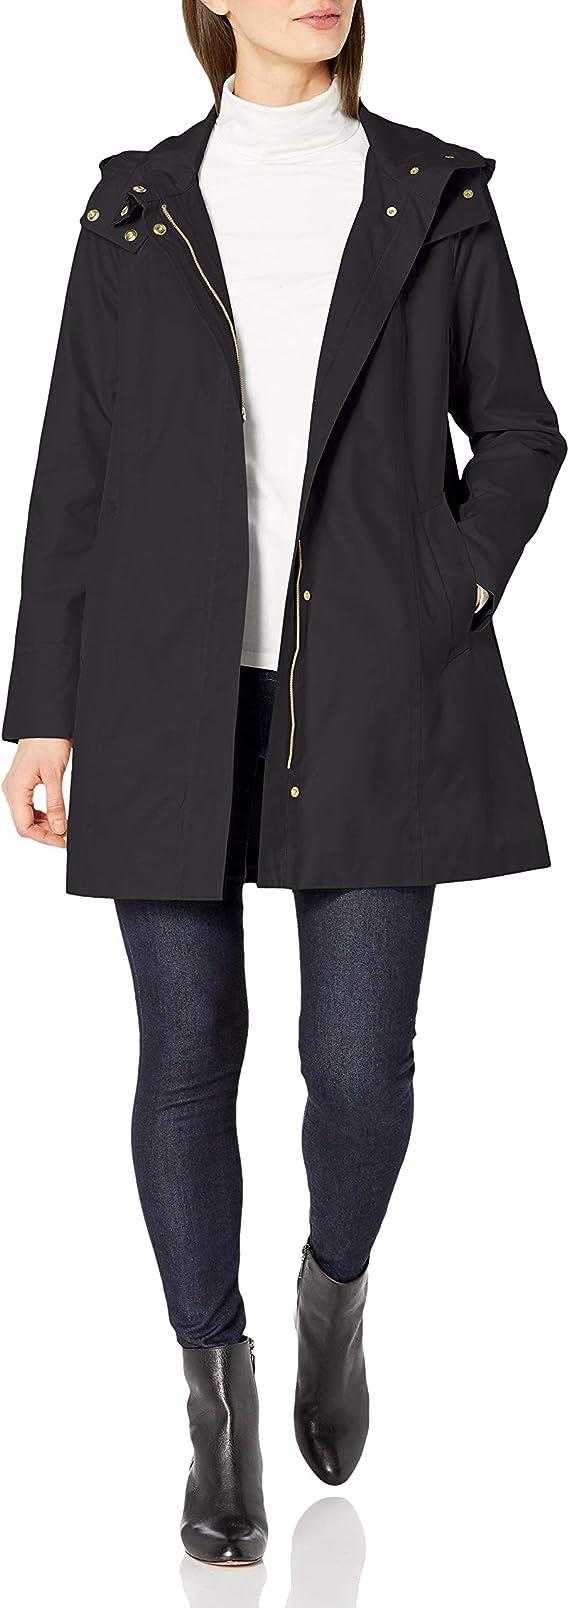 Cole Haan 可汗 女式连帽风衣外套 S码2折$39.88 海淘转运到手约¥337